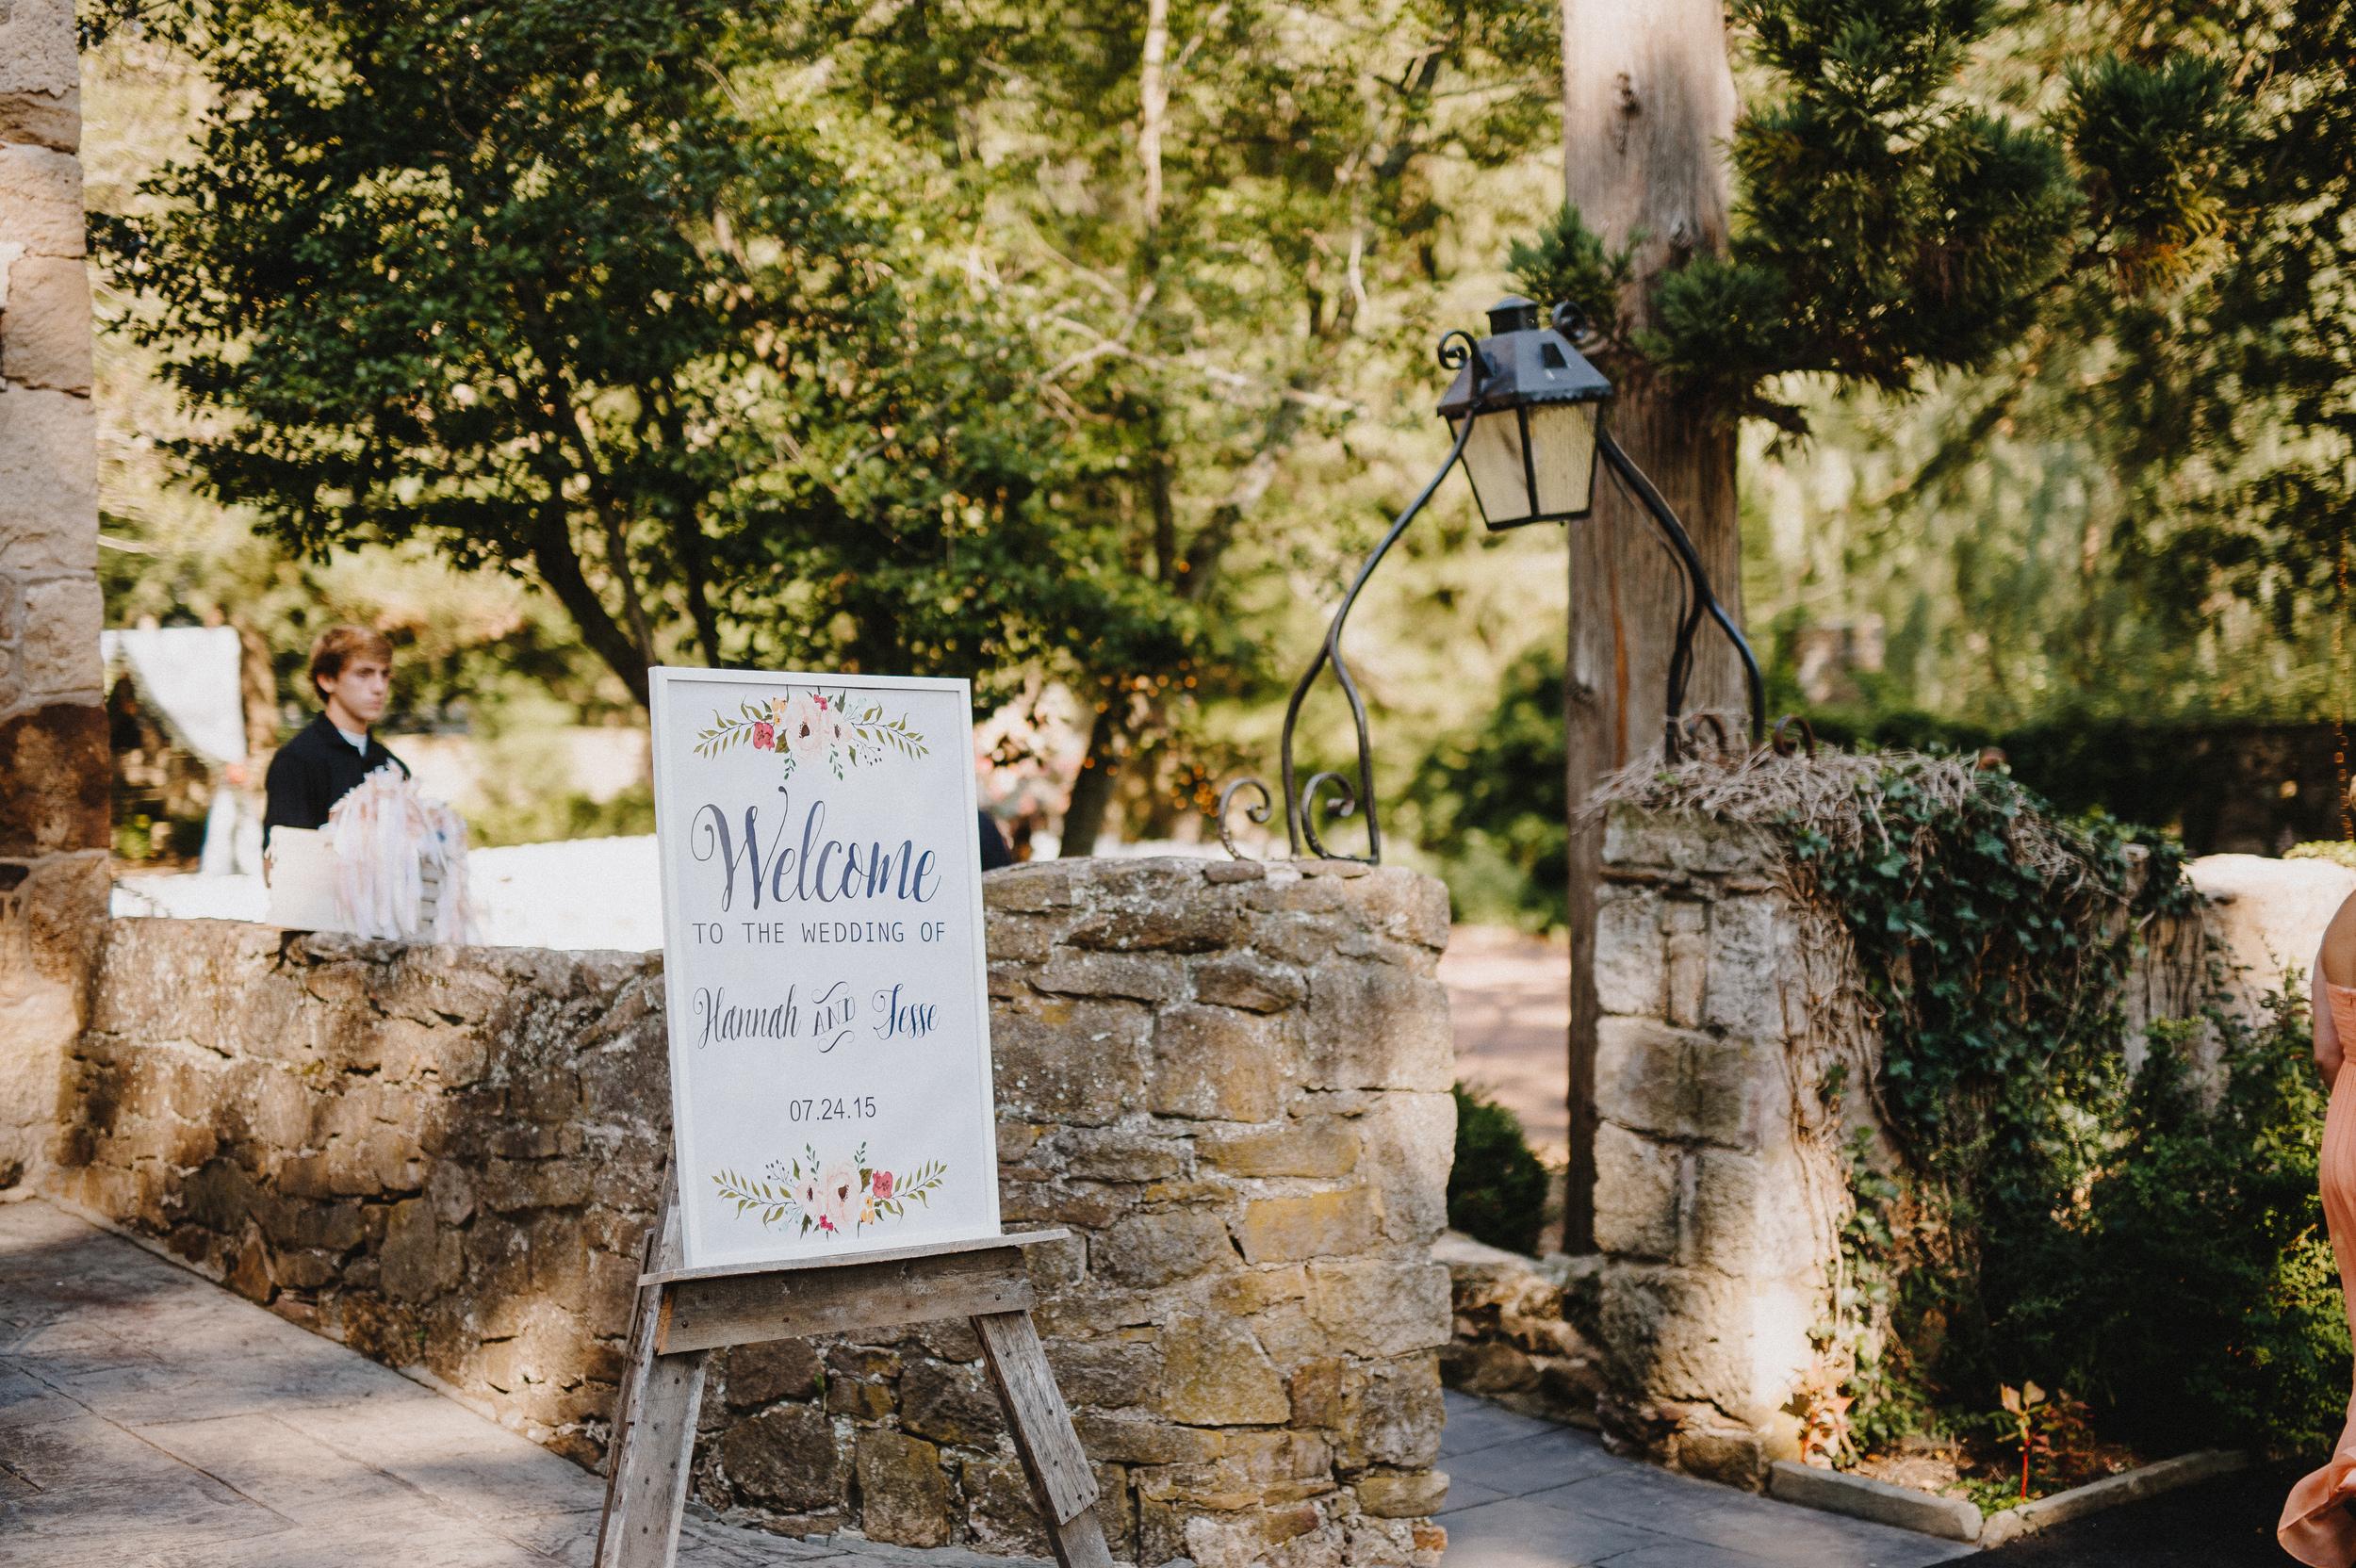 holly-hedge-estate-wedding-photographer-pat-robinson-photography-46.jpg